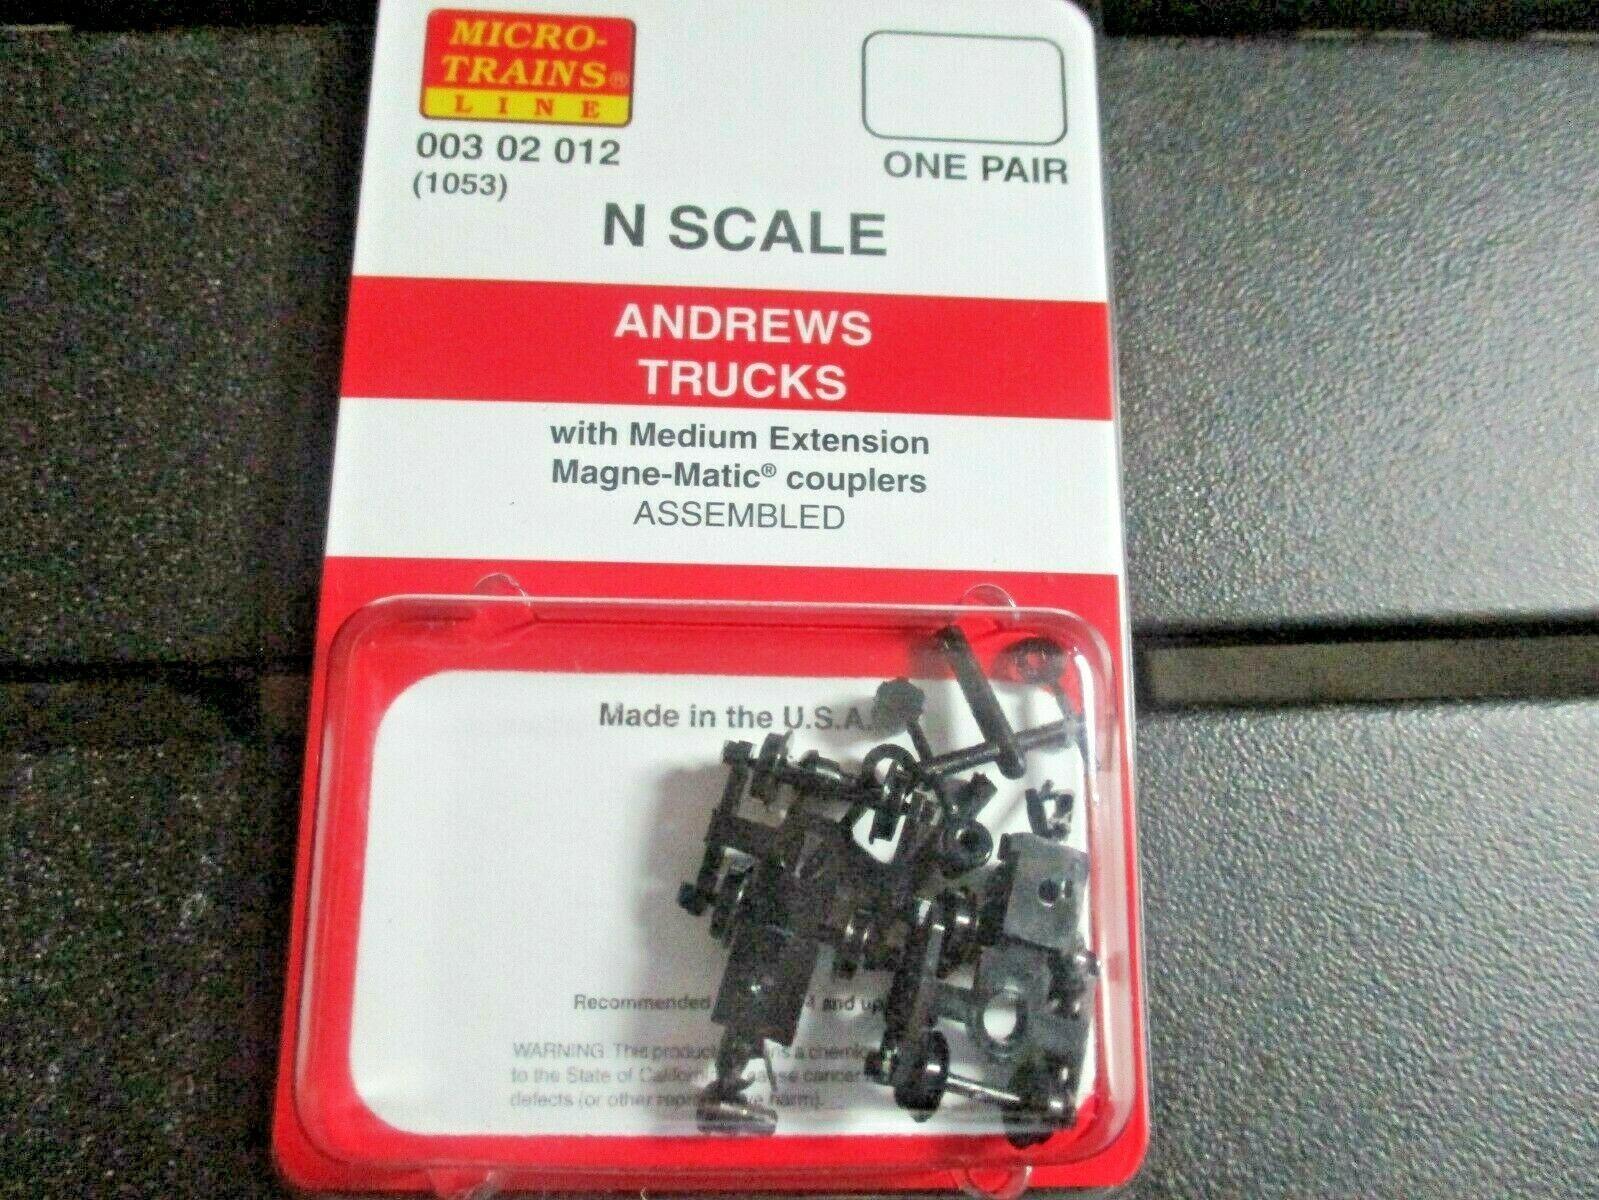 Micro-Trains Stock # 00302012 (1053) Andrews Trucks  Medium Extension N-Scale